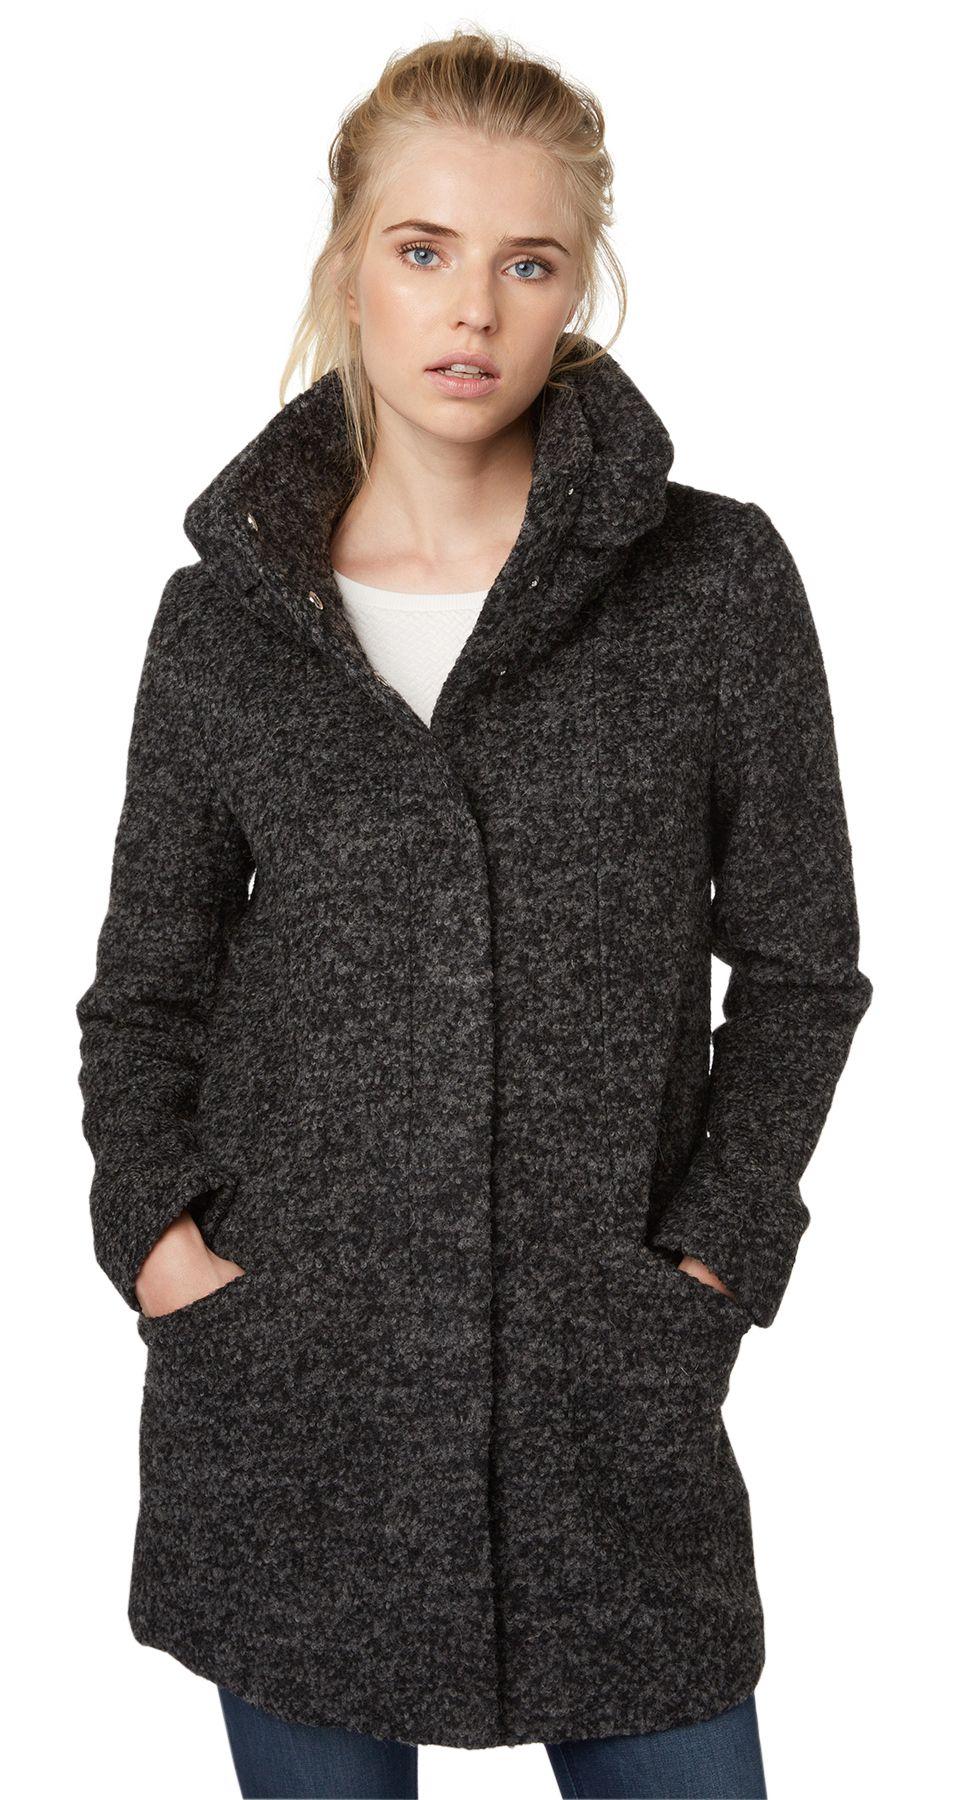 tom tailor denim jacke wool coat with big collar schwab versand outdoorjacken. Black Bedroom Furniture Sets. Home Design Ideas